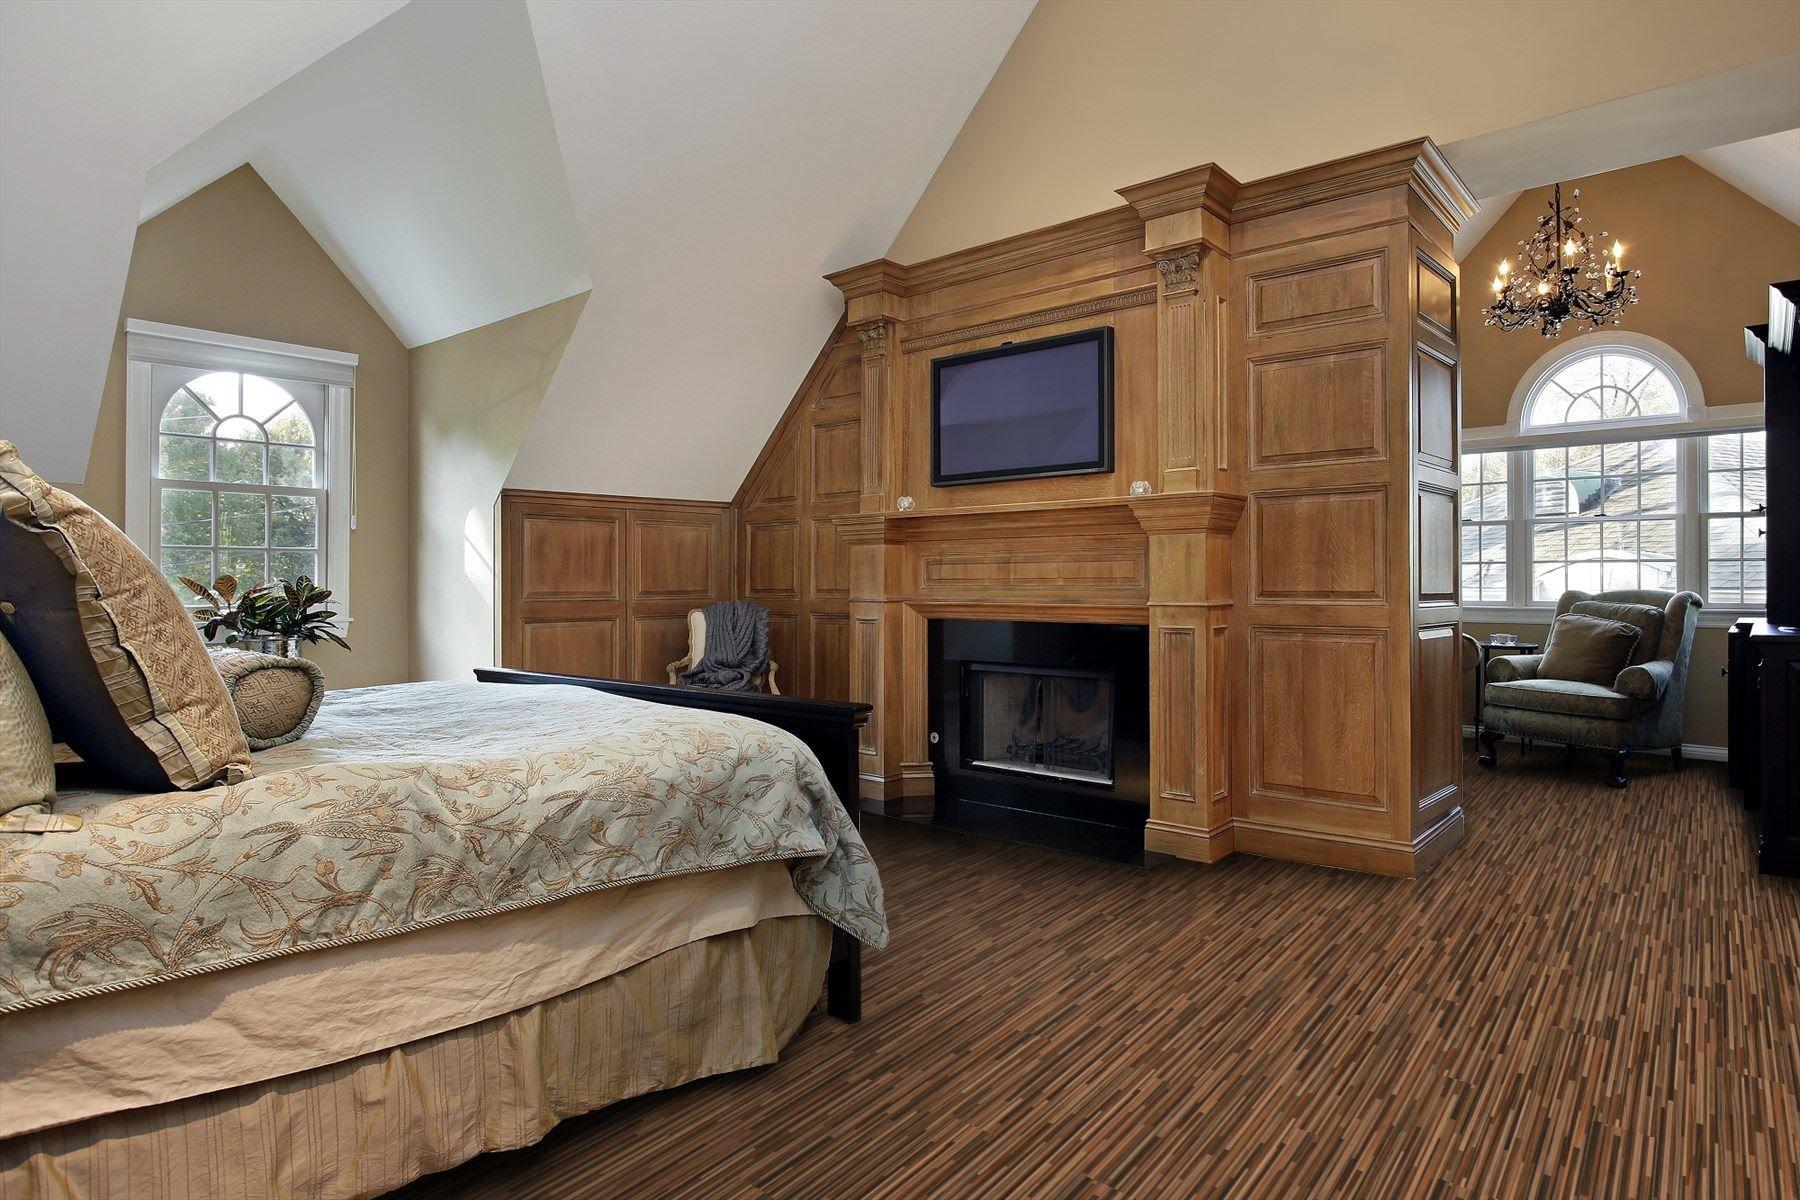 Fußboden Jordan ~ Cutting board stripes laminate flooring rustic schlafzimmer